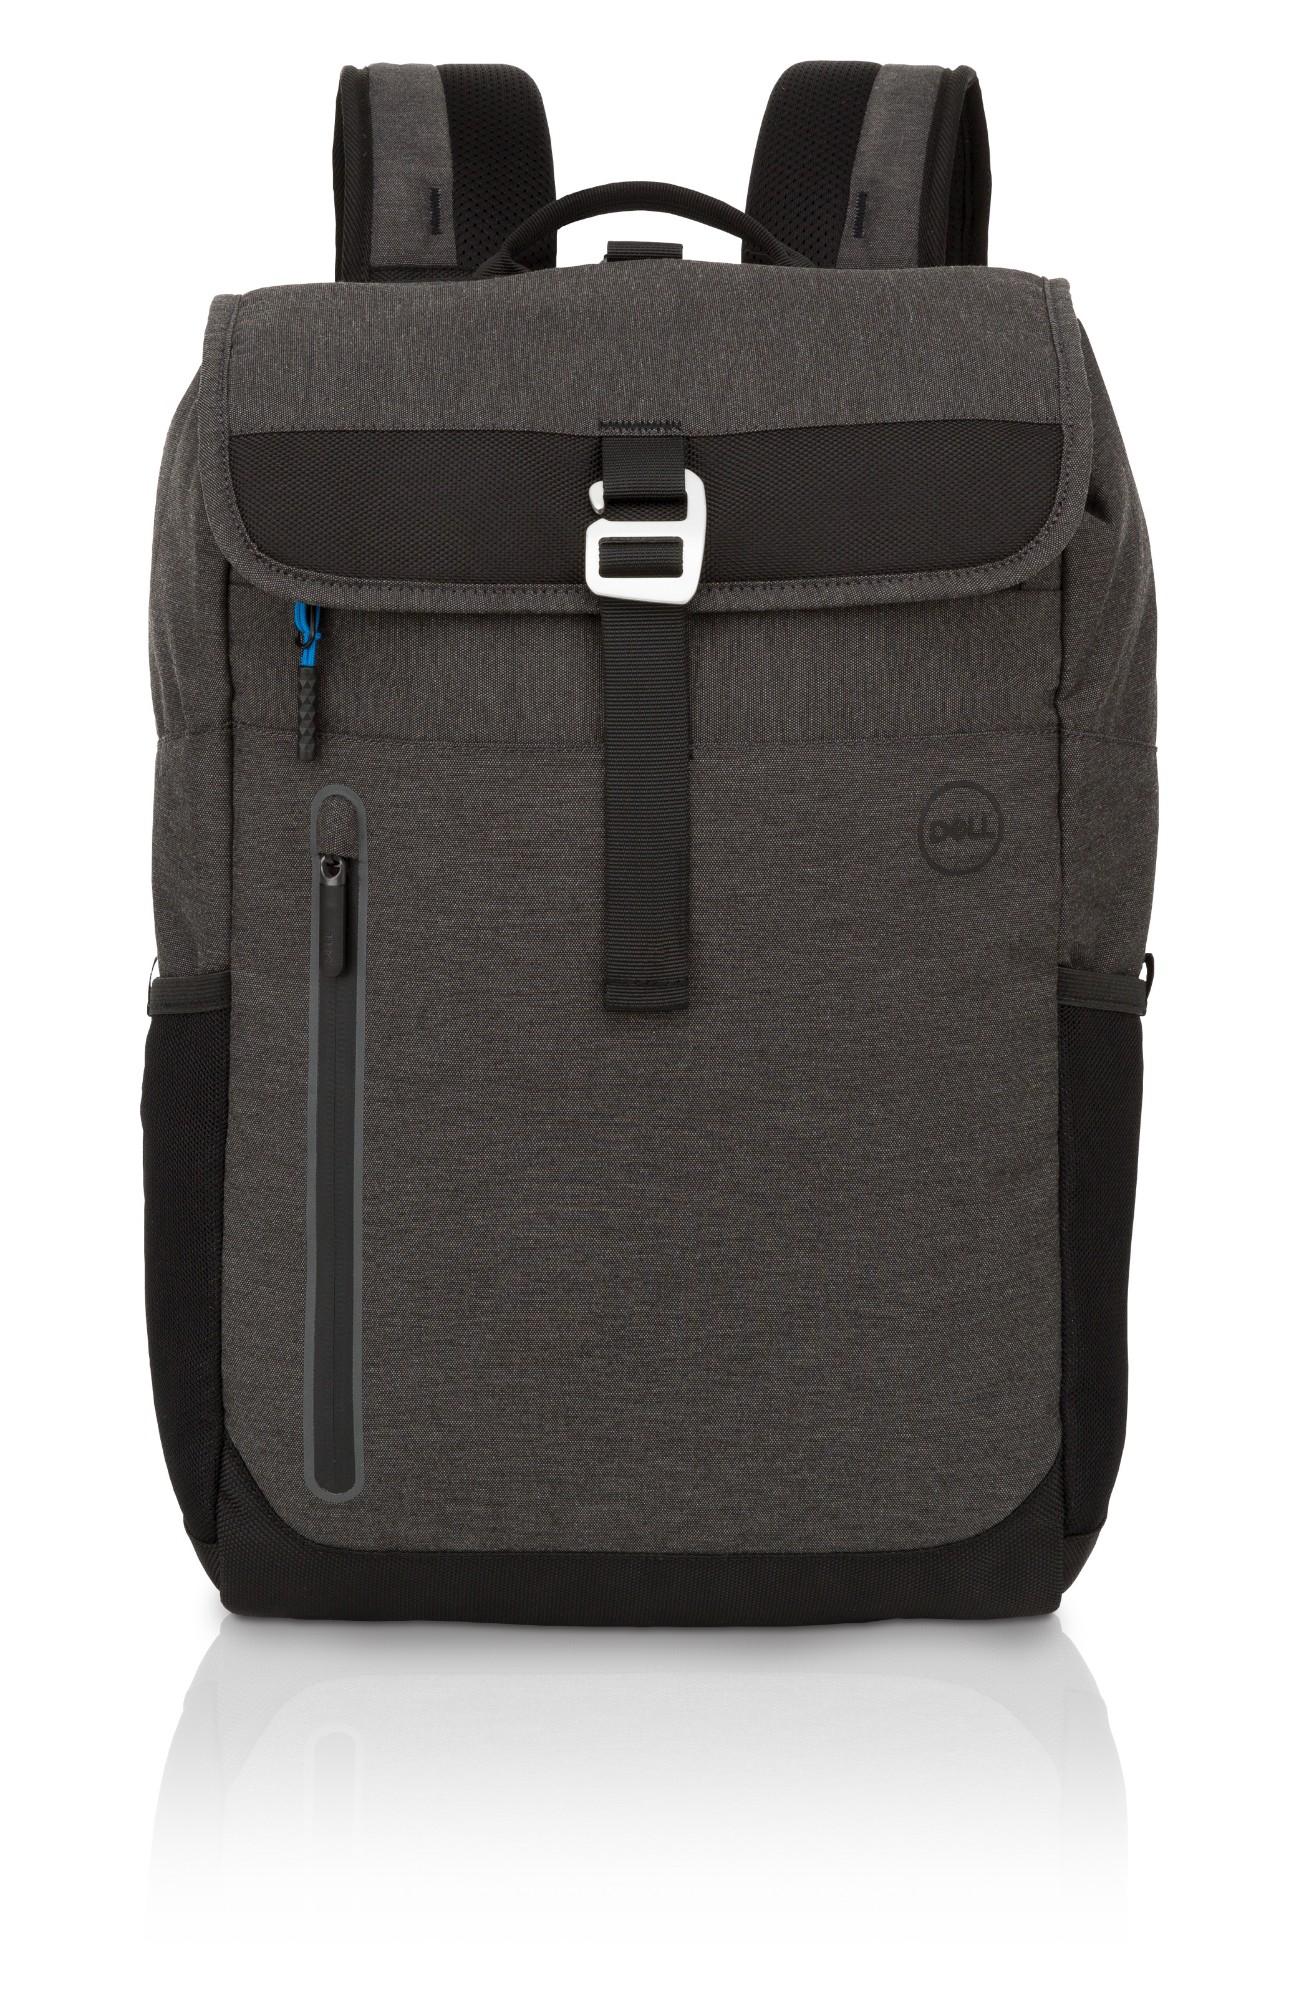 "DELL Venture Backpack 15"" maletines para portátil 39,6 cm (15.6"") Funda tipo mochila Gris"